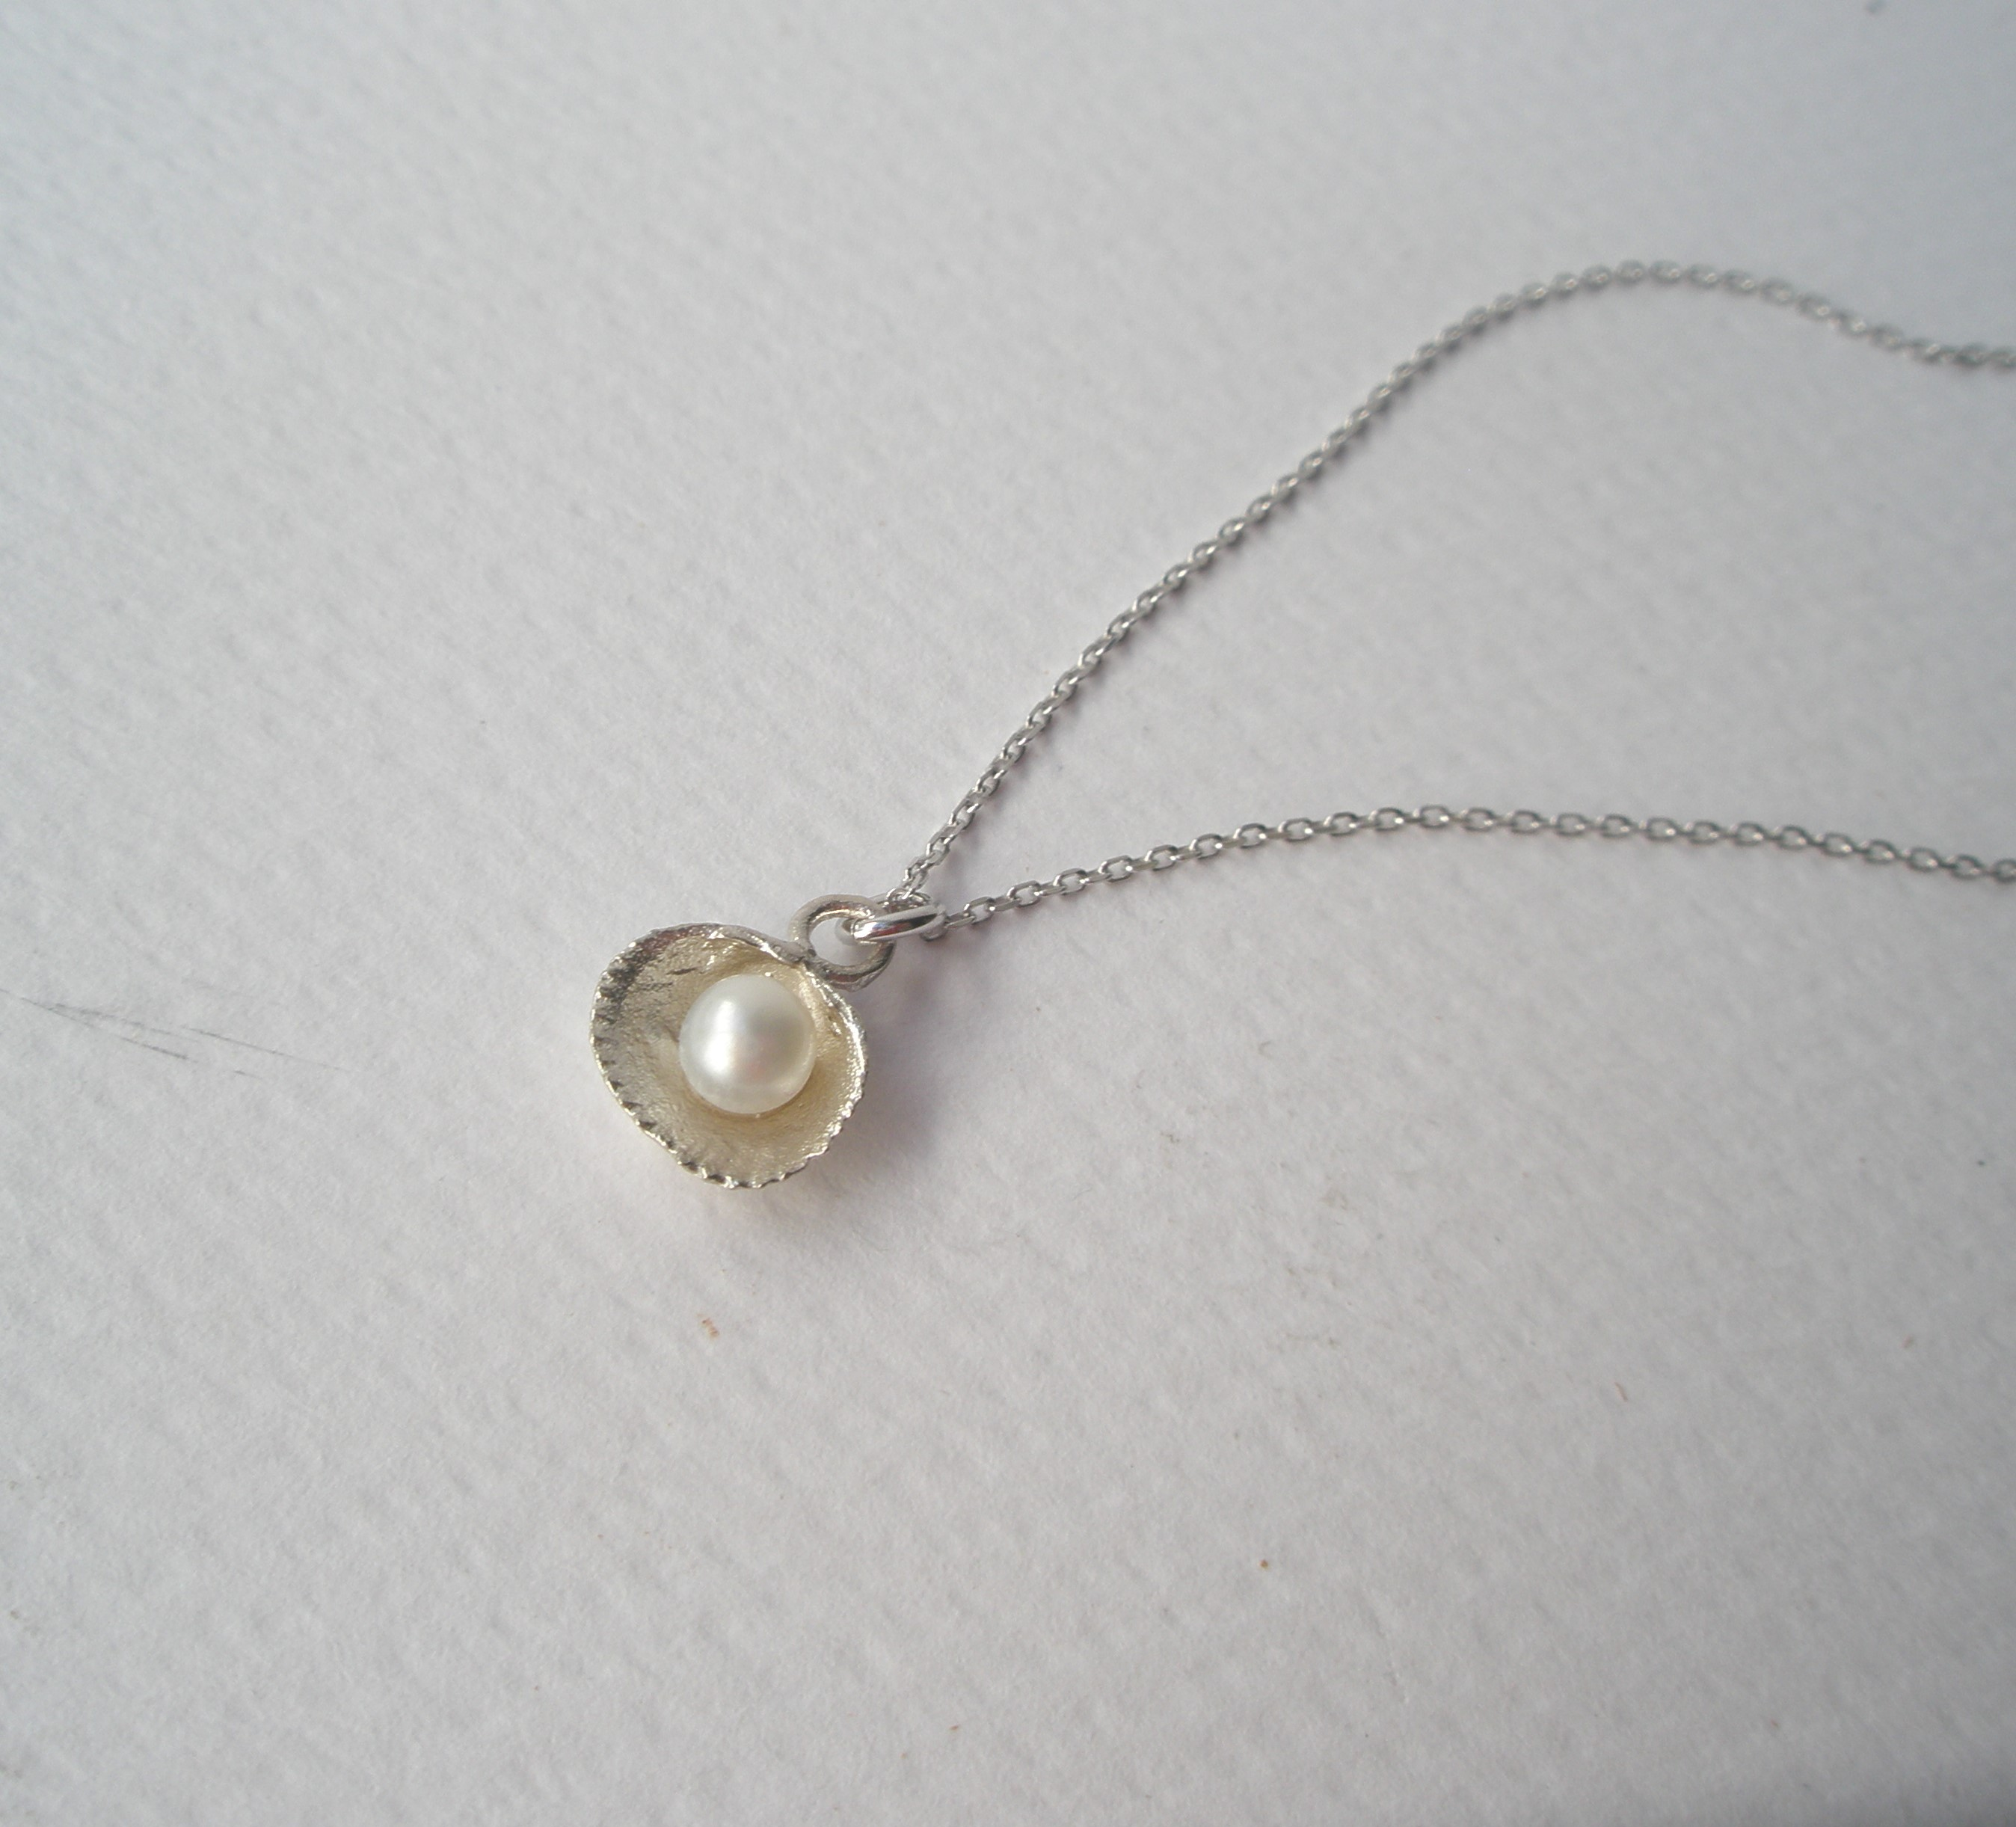 97a32406bc Ασημένιο μενταγιόν αχιβάδα με μαργαριτάρι ~ Velli